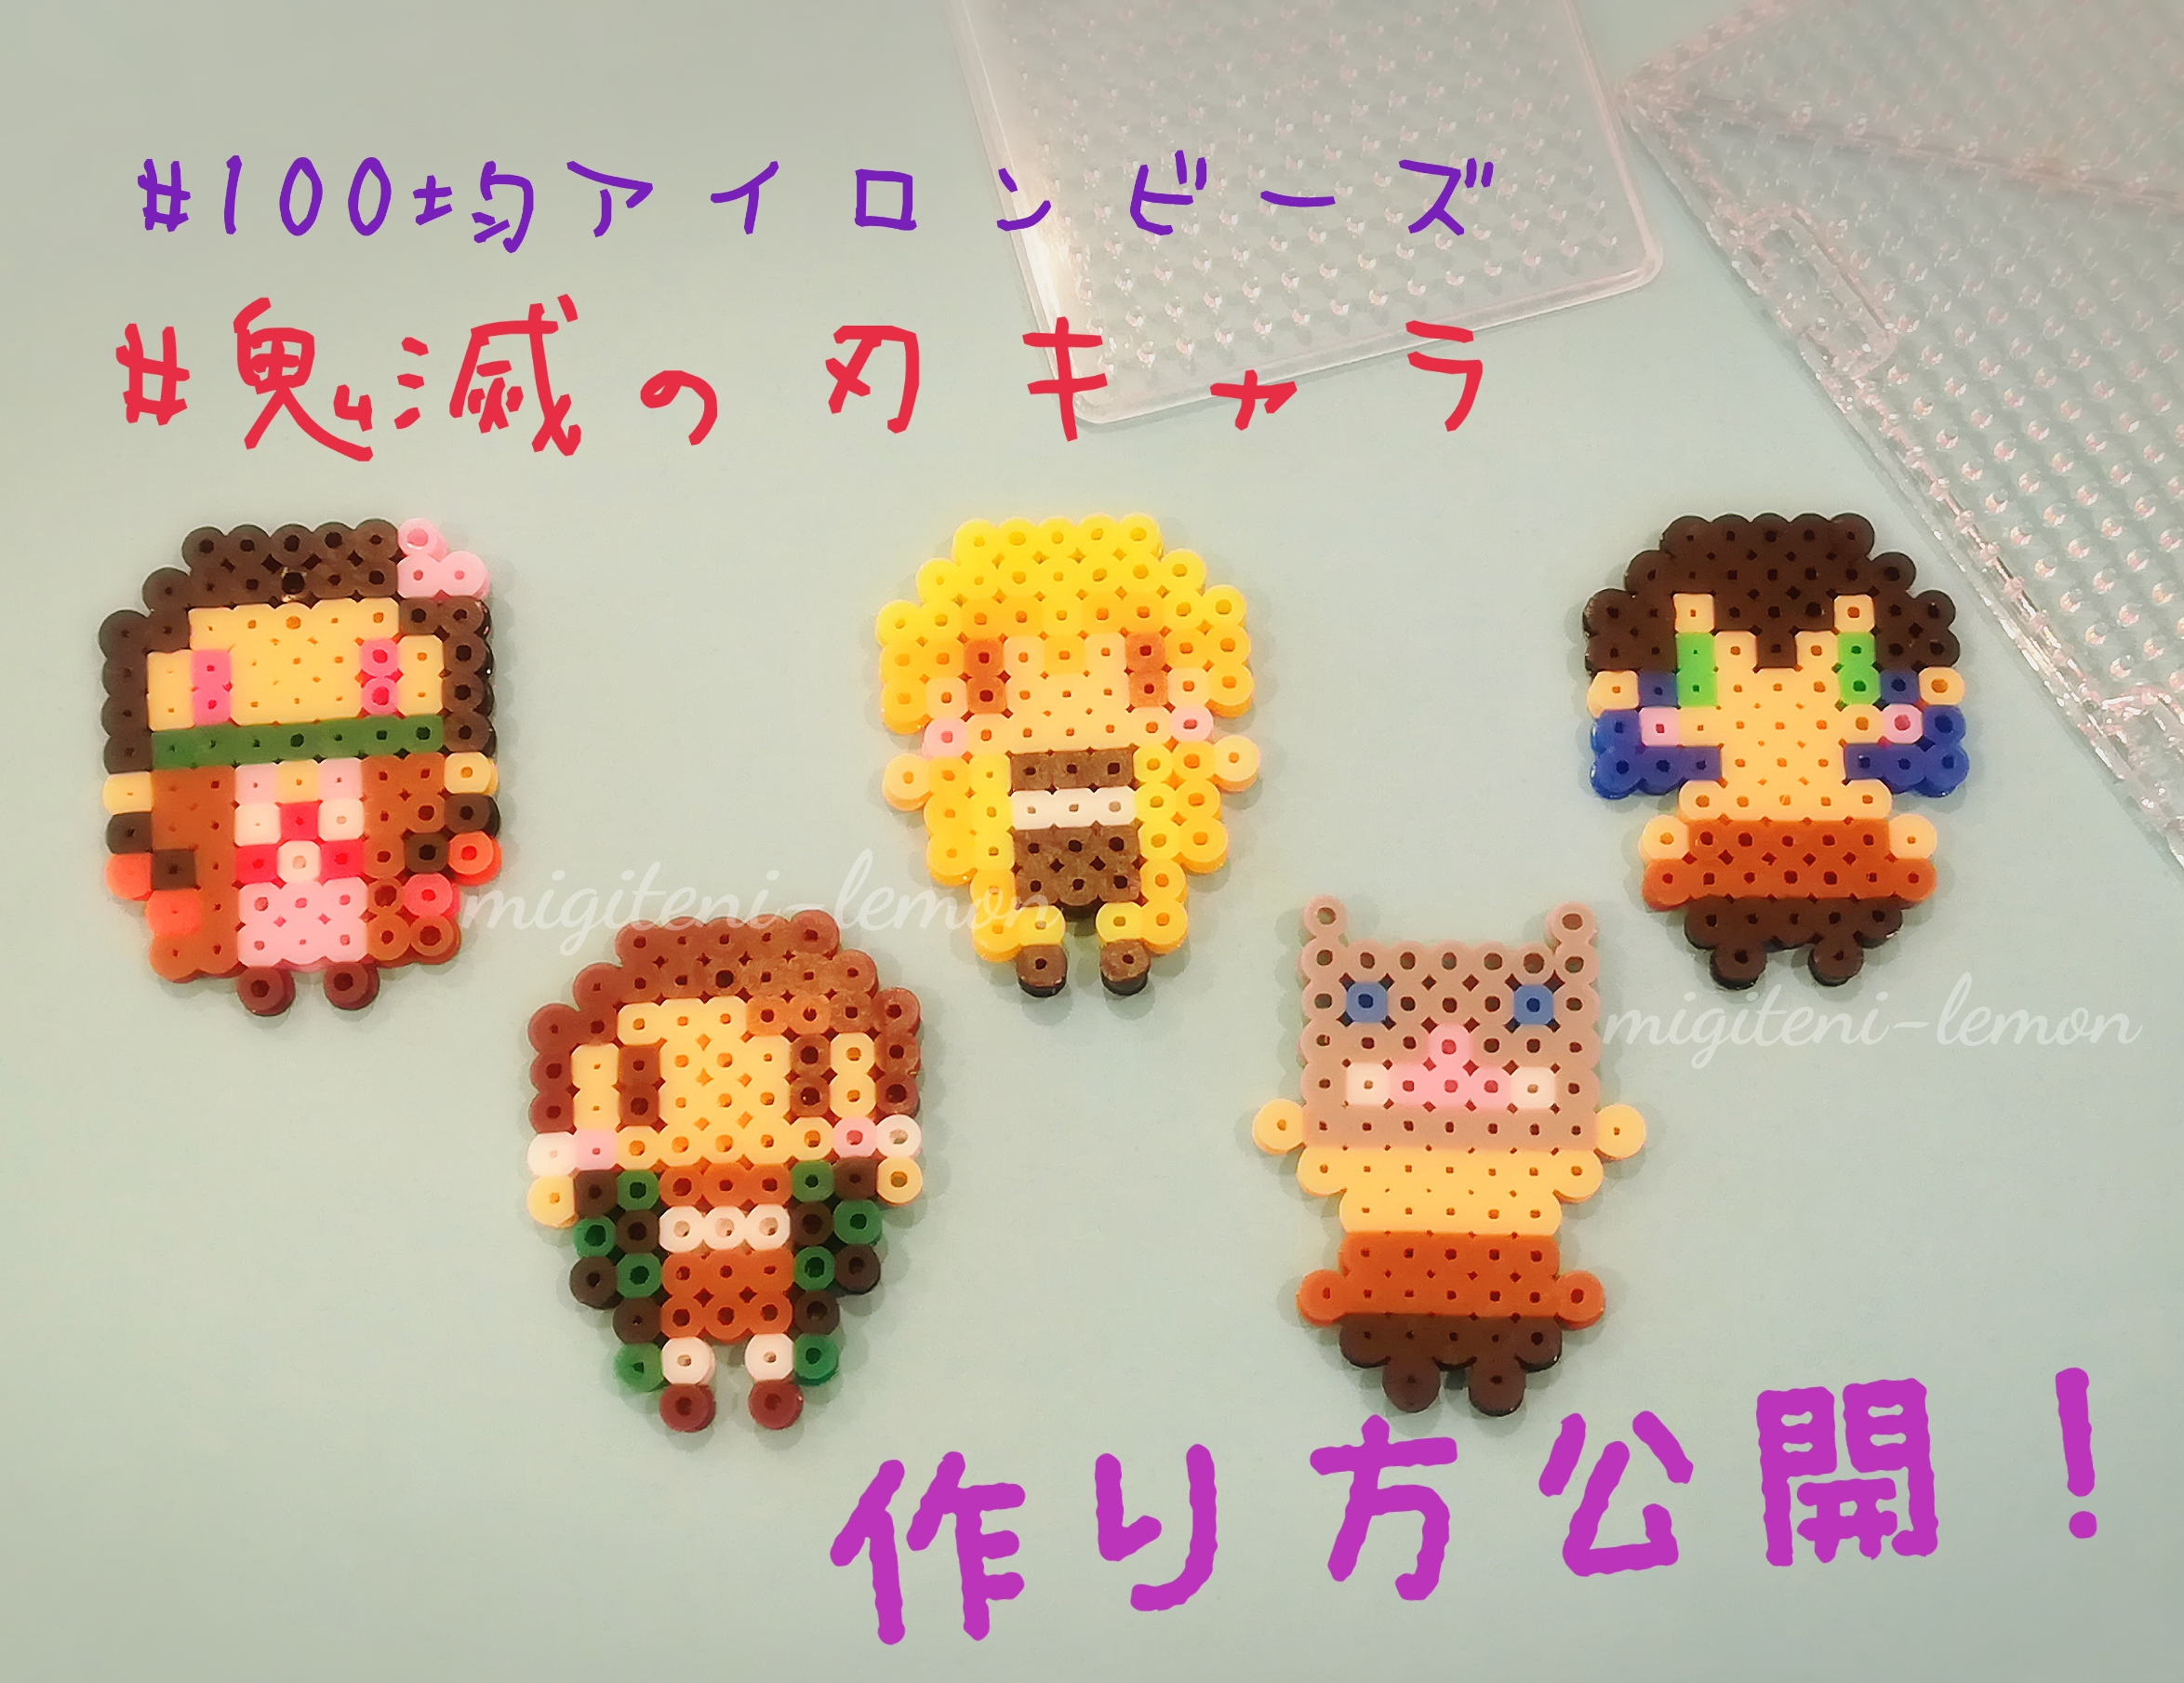 kimetsu-character-daiso